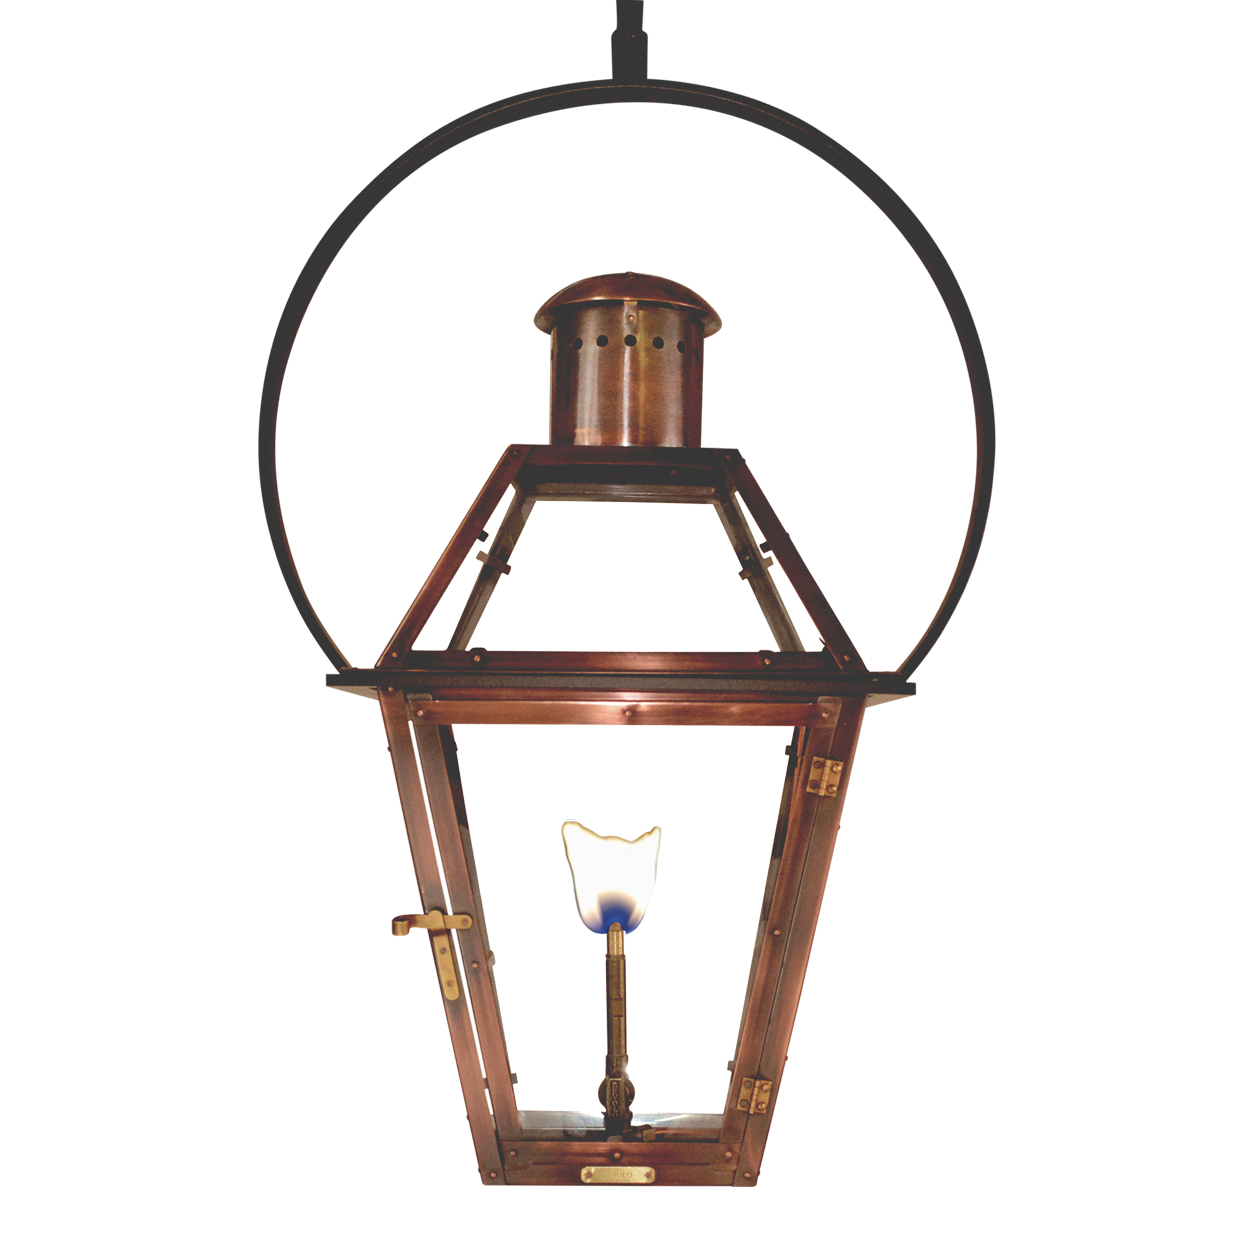 French Quarter On Yoke Bracket By Bevolo Gas Electric Lights Copper Lighting Shop Pendant Lights Kitchen Pendants